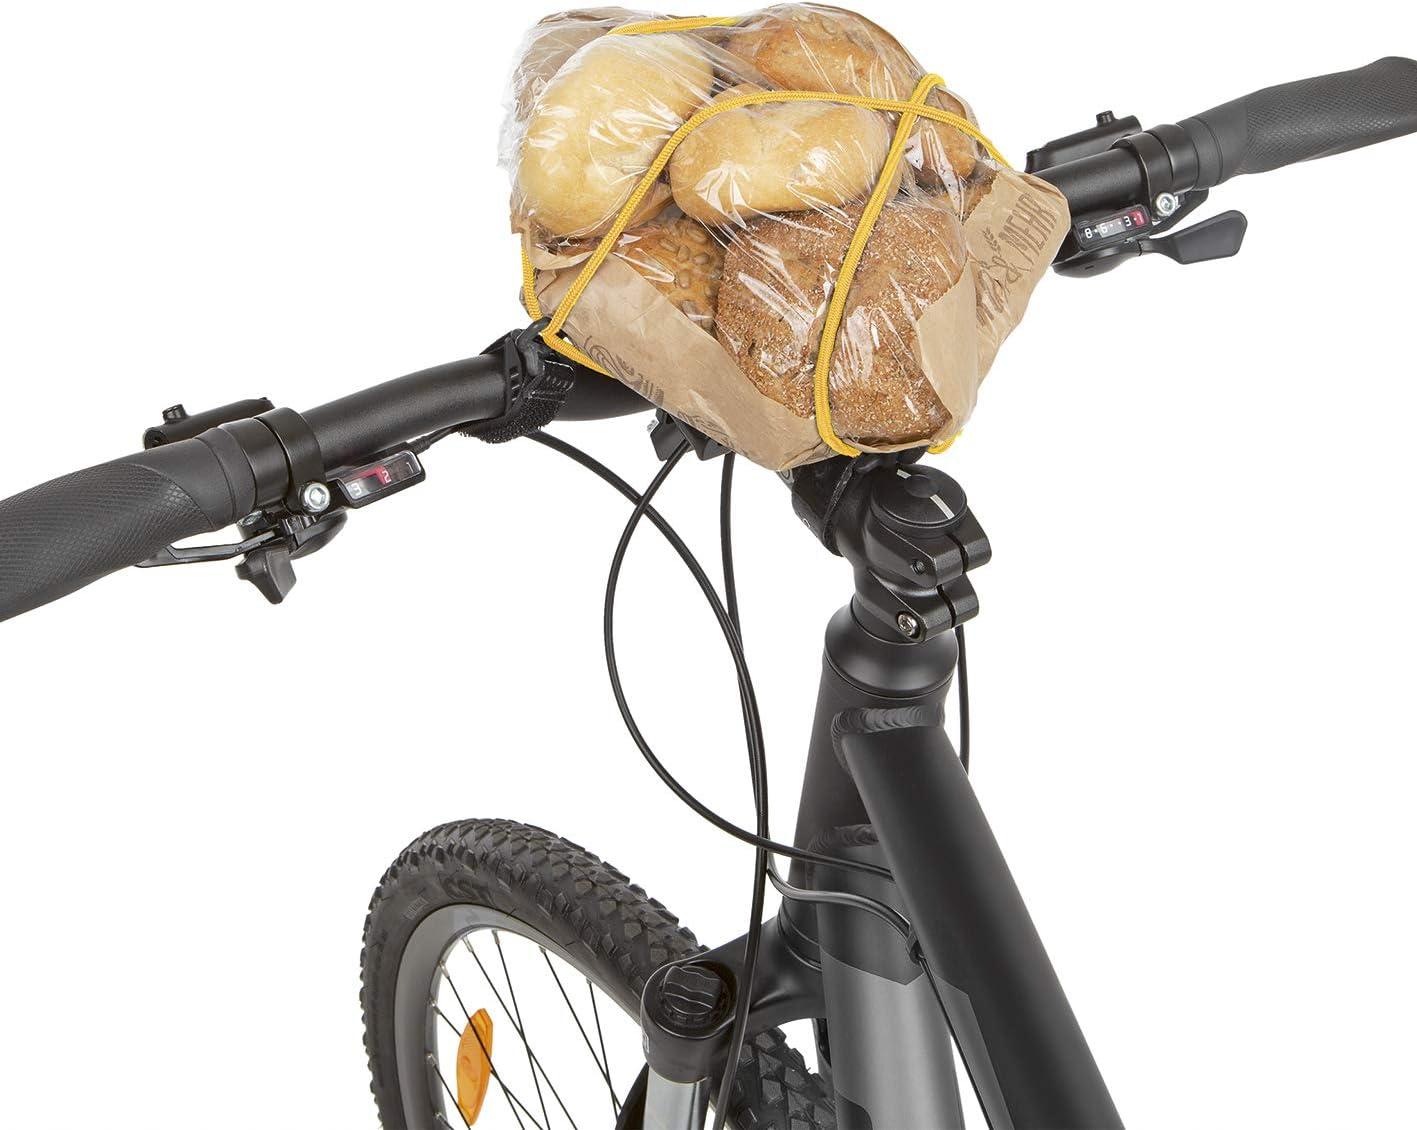 carryyygum Lenkerspannband 105cm Fahrradlenker Elastisches Gummiband Mini-Gep/äcktr/äger f Spanngummi Klettverschluss Gep/äckspanner